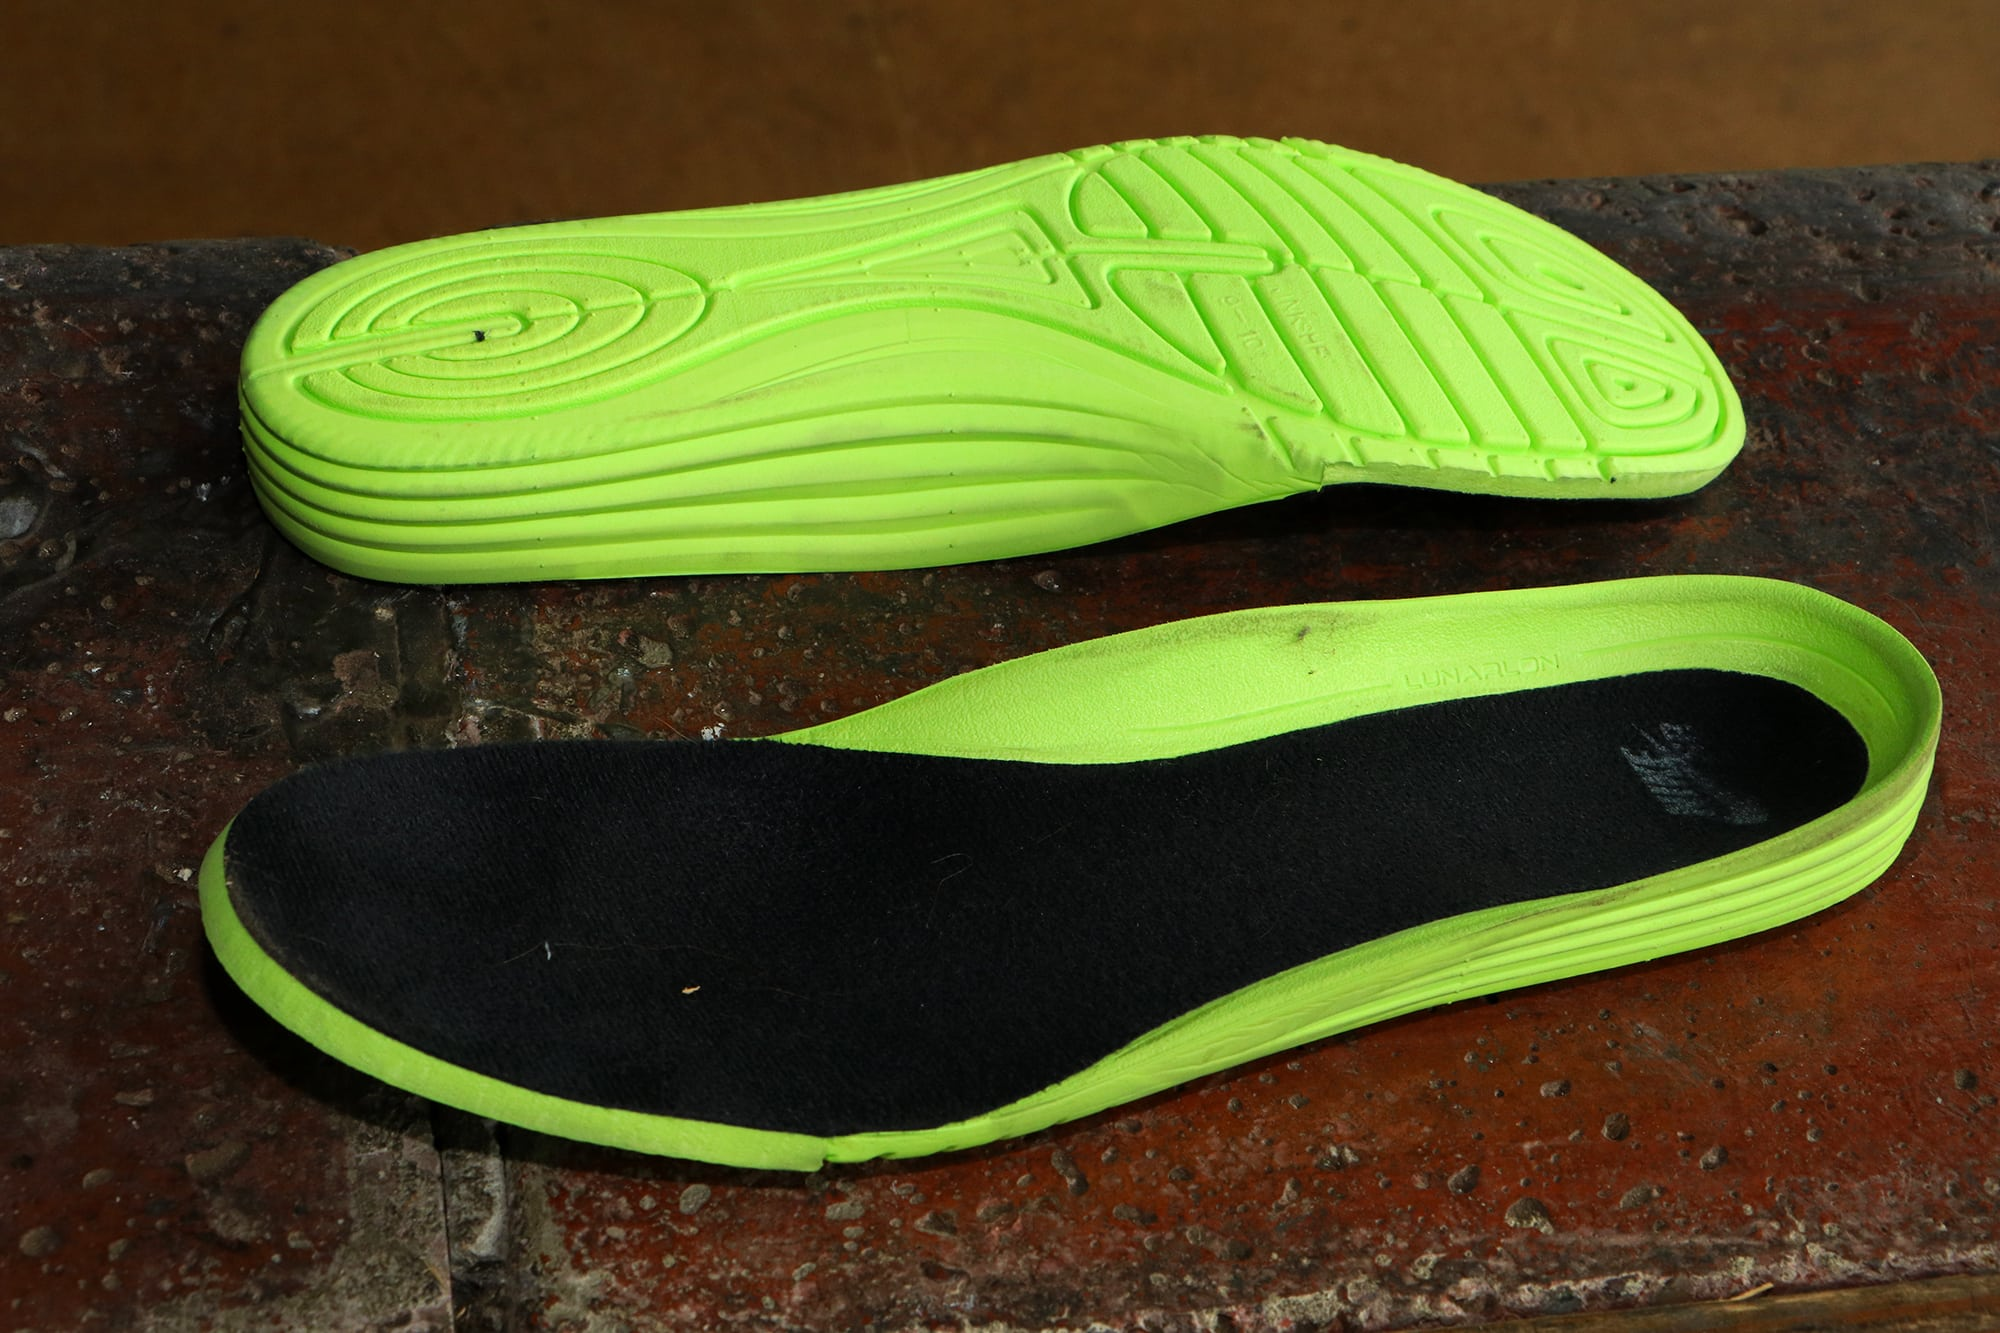 Nike SB Janoski Hyperfeel Skate Shoes Wear Test Review